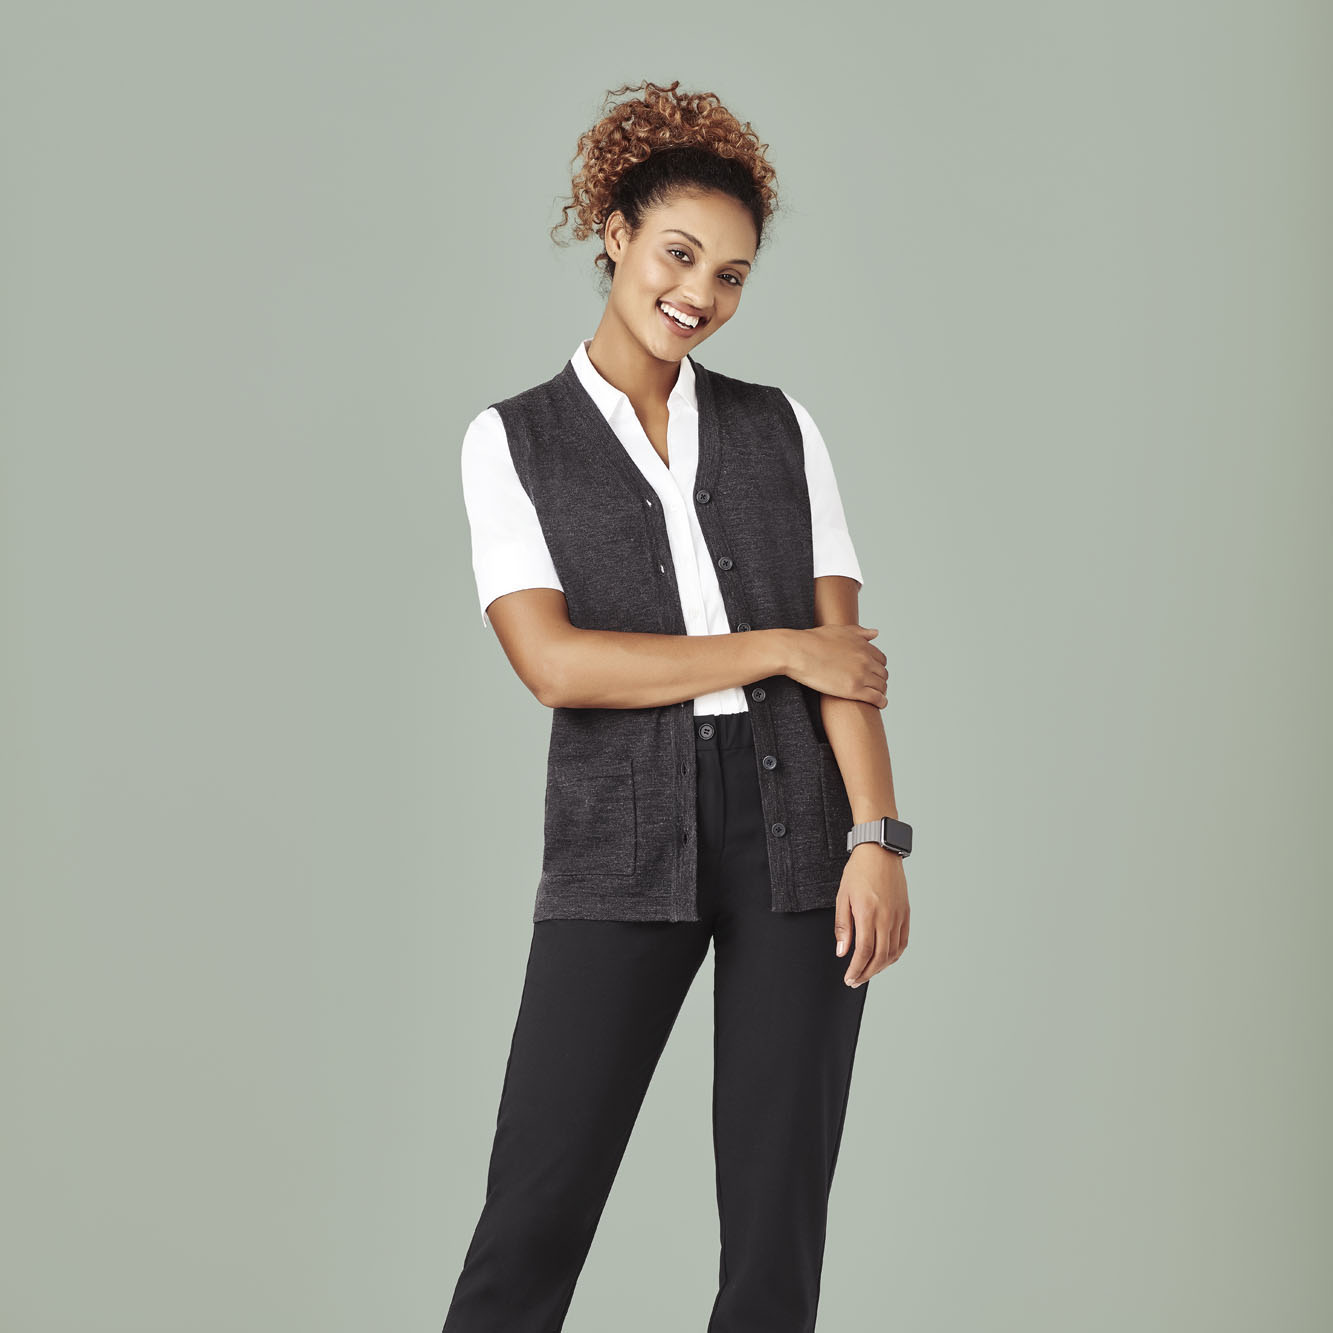 NEW Womens Button Front Vest - CK961LV